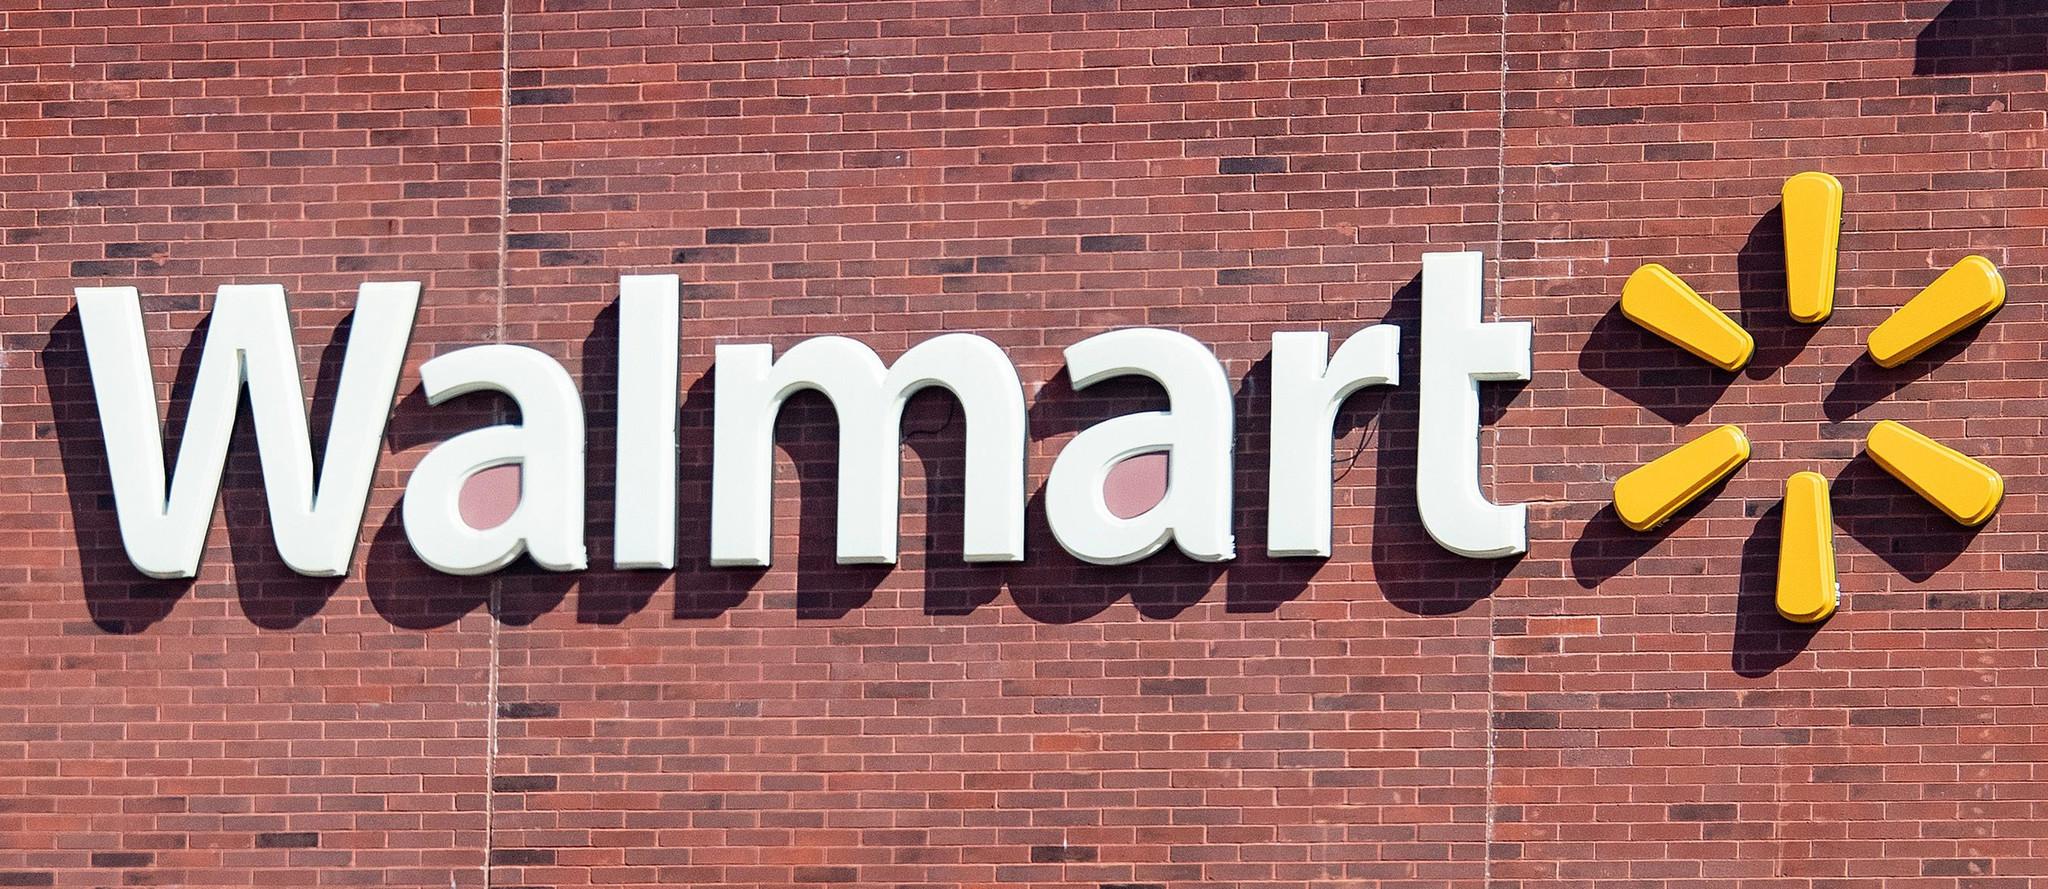 Georgia man opens fire at Walmart, then shoots himself